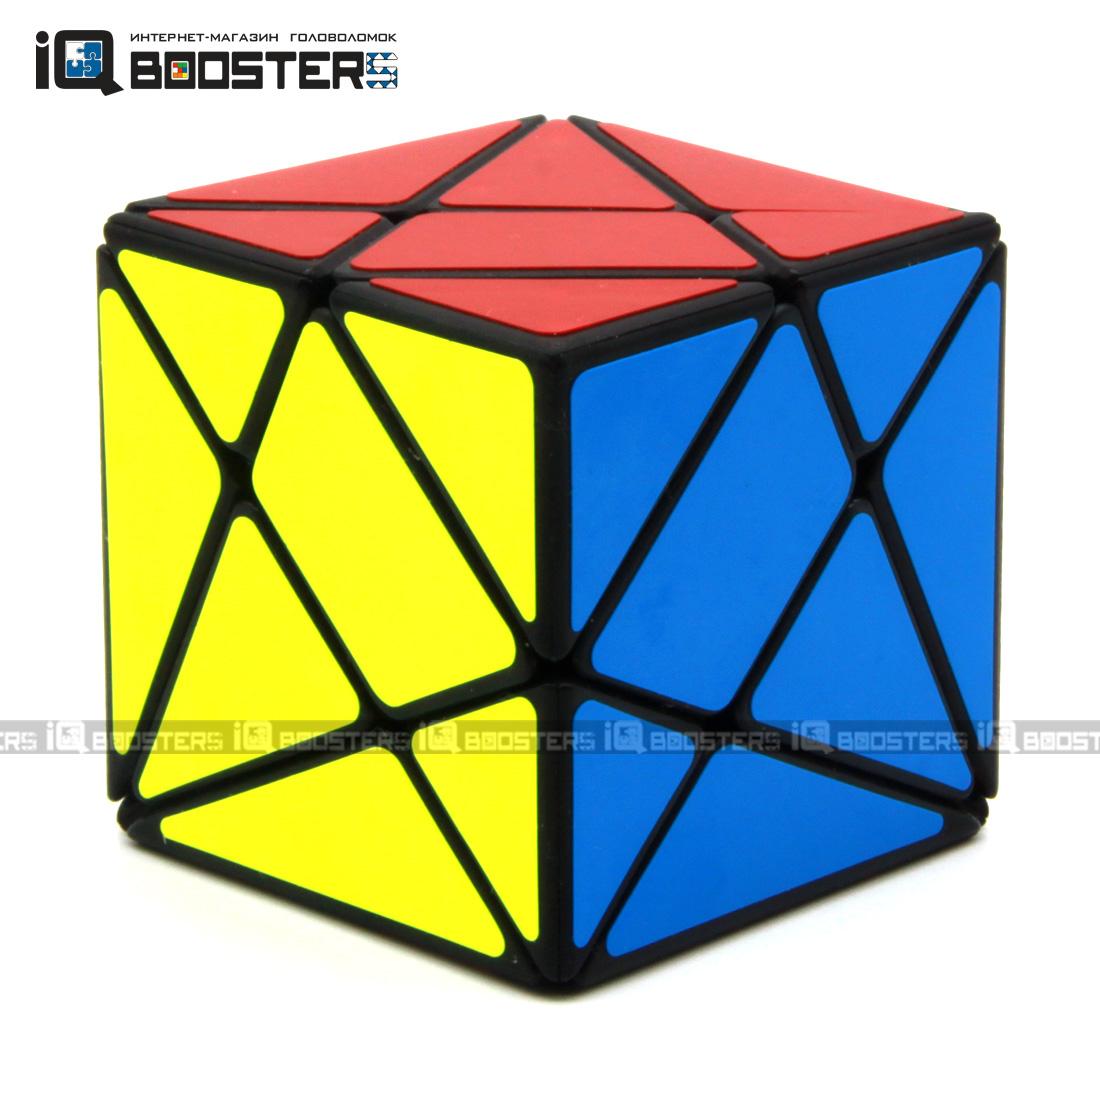 qiyi_axis_cube_3